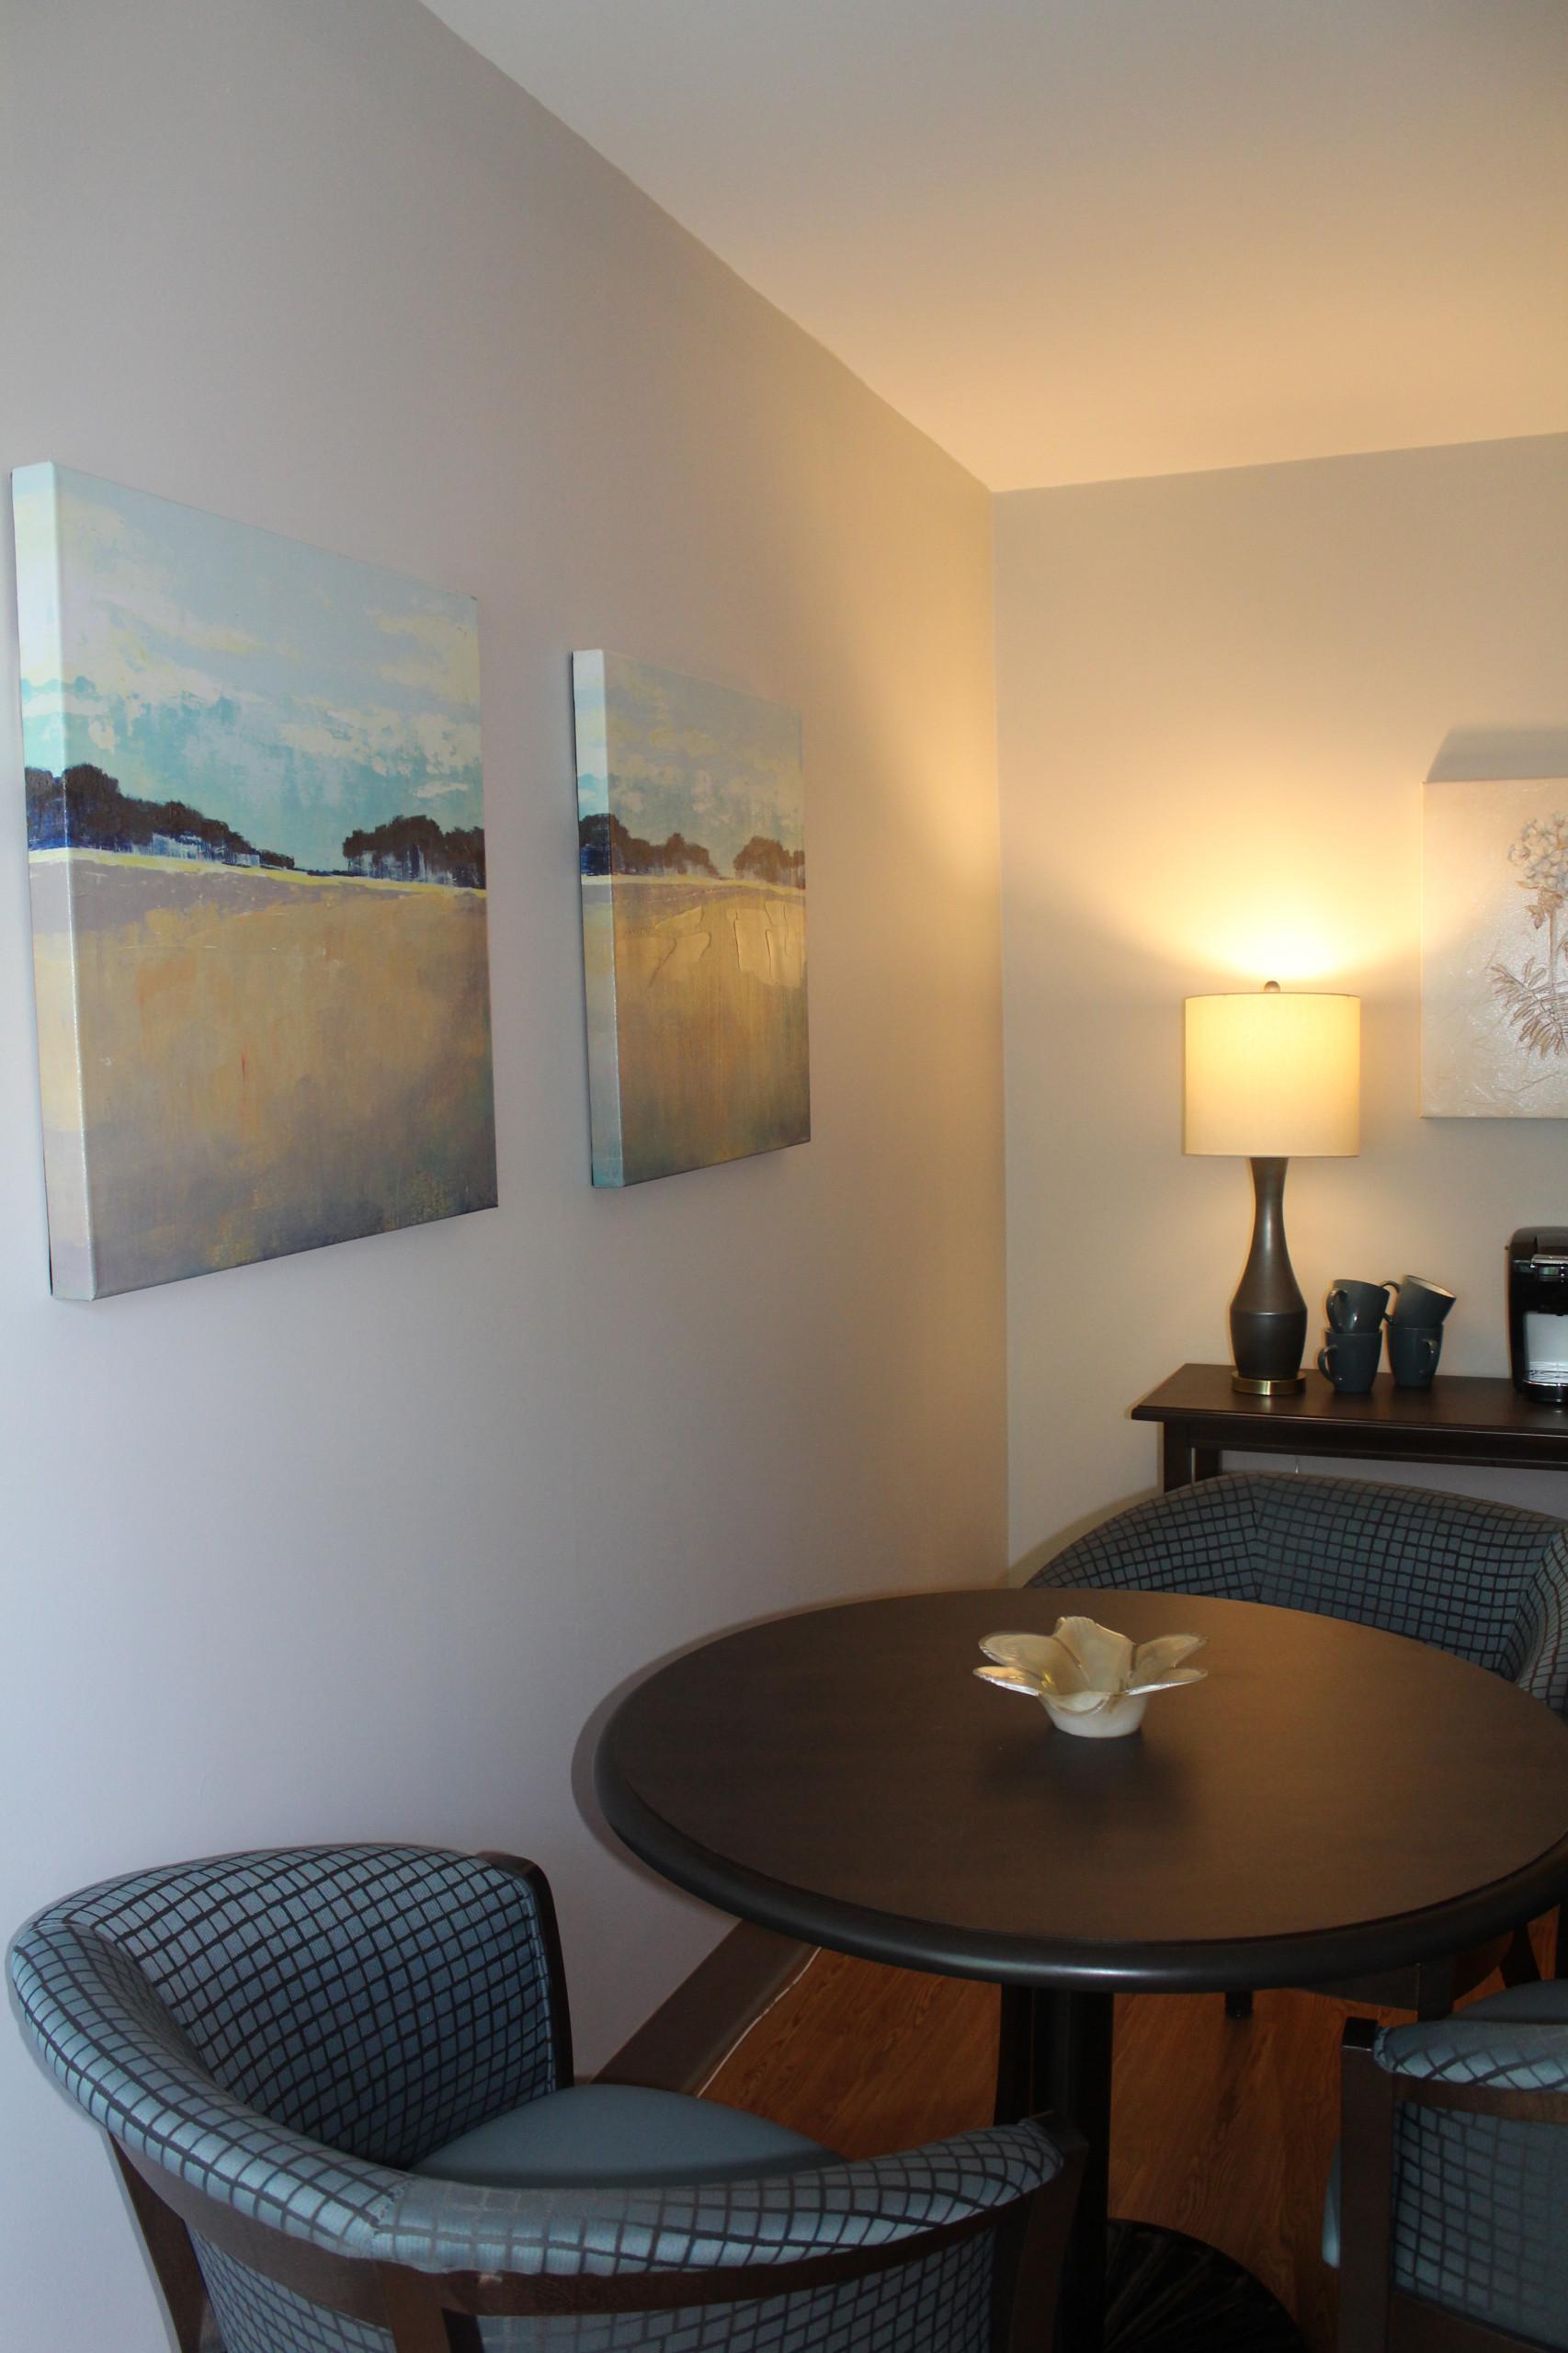 retirement community interiors- tower of port hope